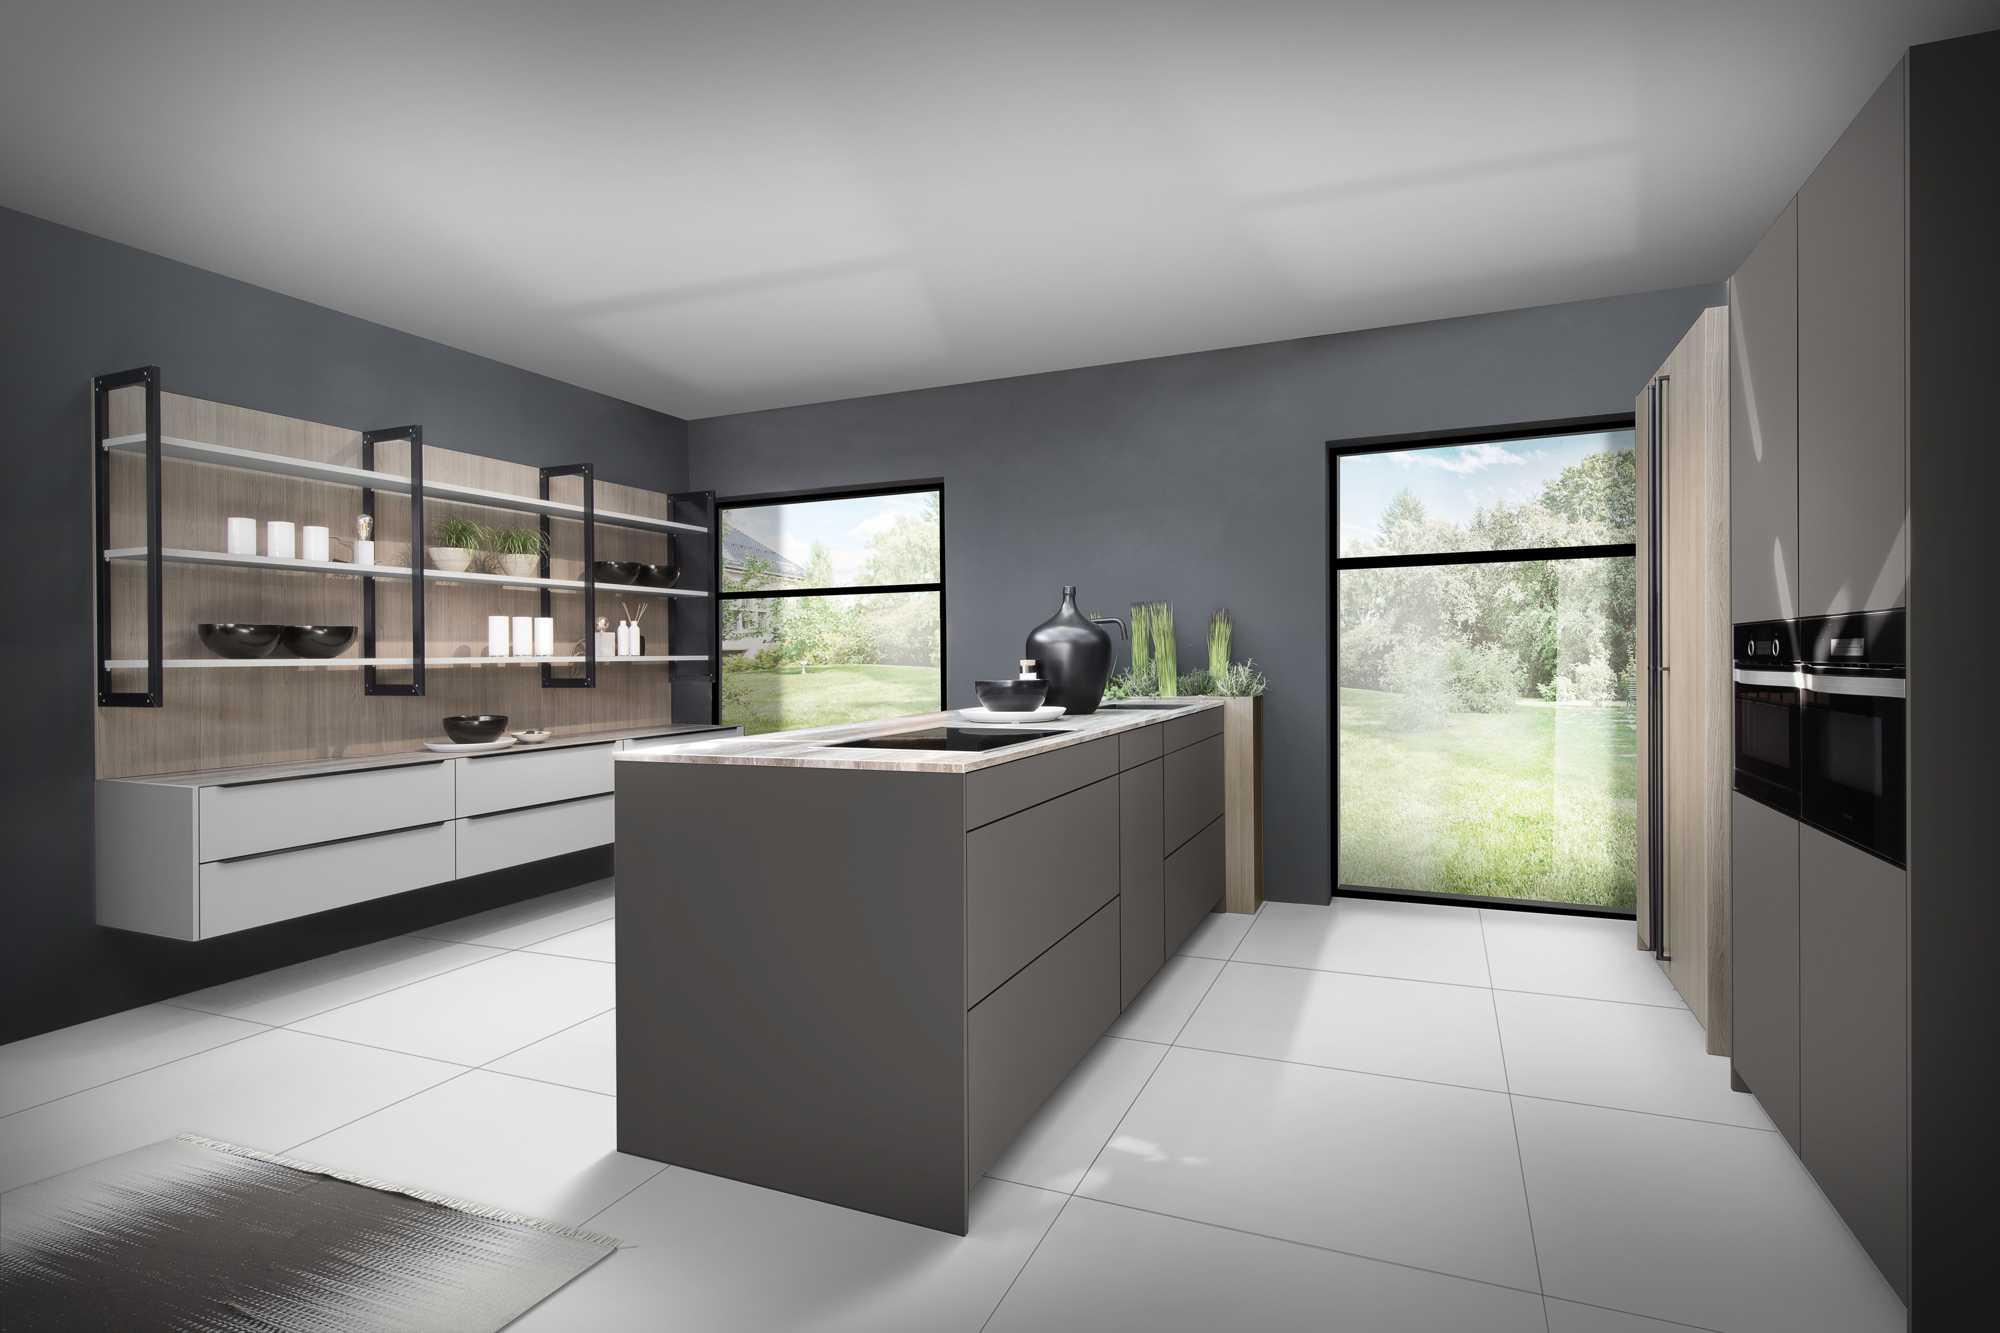 Three tone modern german kitchen: ZeroxUmbra, Kashmir and City Grey Oak combination.